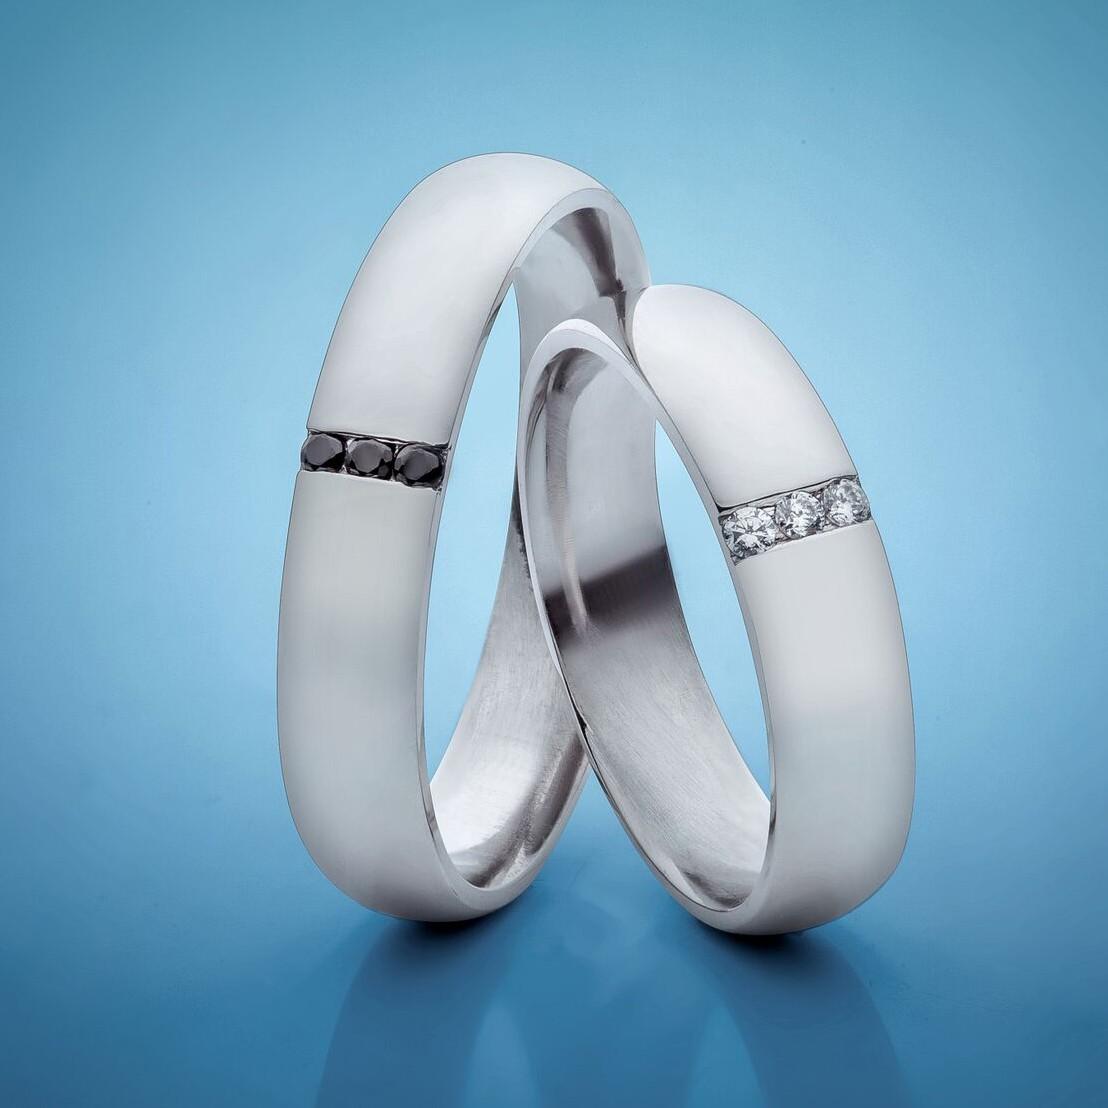 Snubni Prsteny S Bilymi A Cernymi Diamanty C Sn18 Bile Zlato